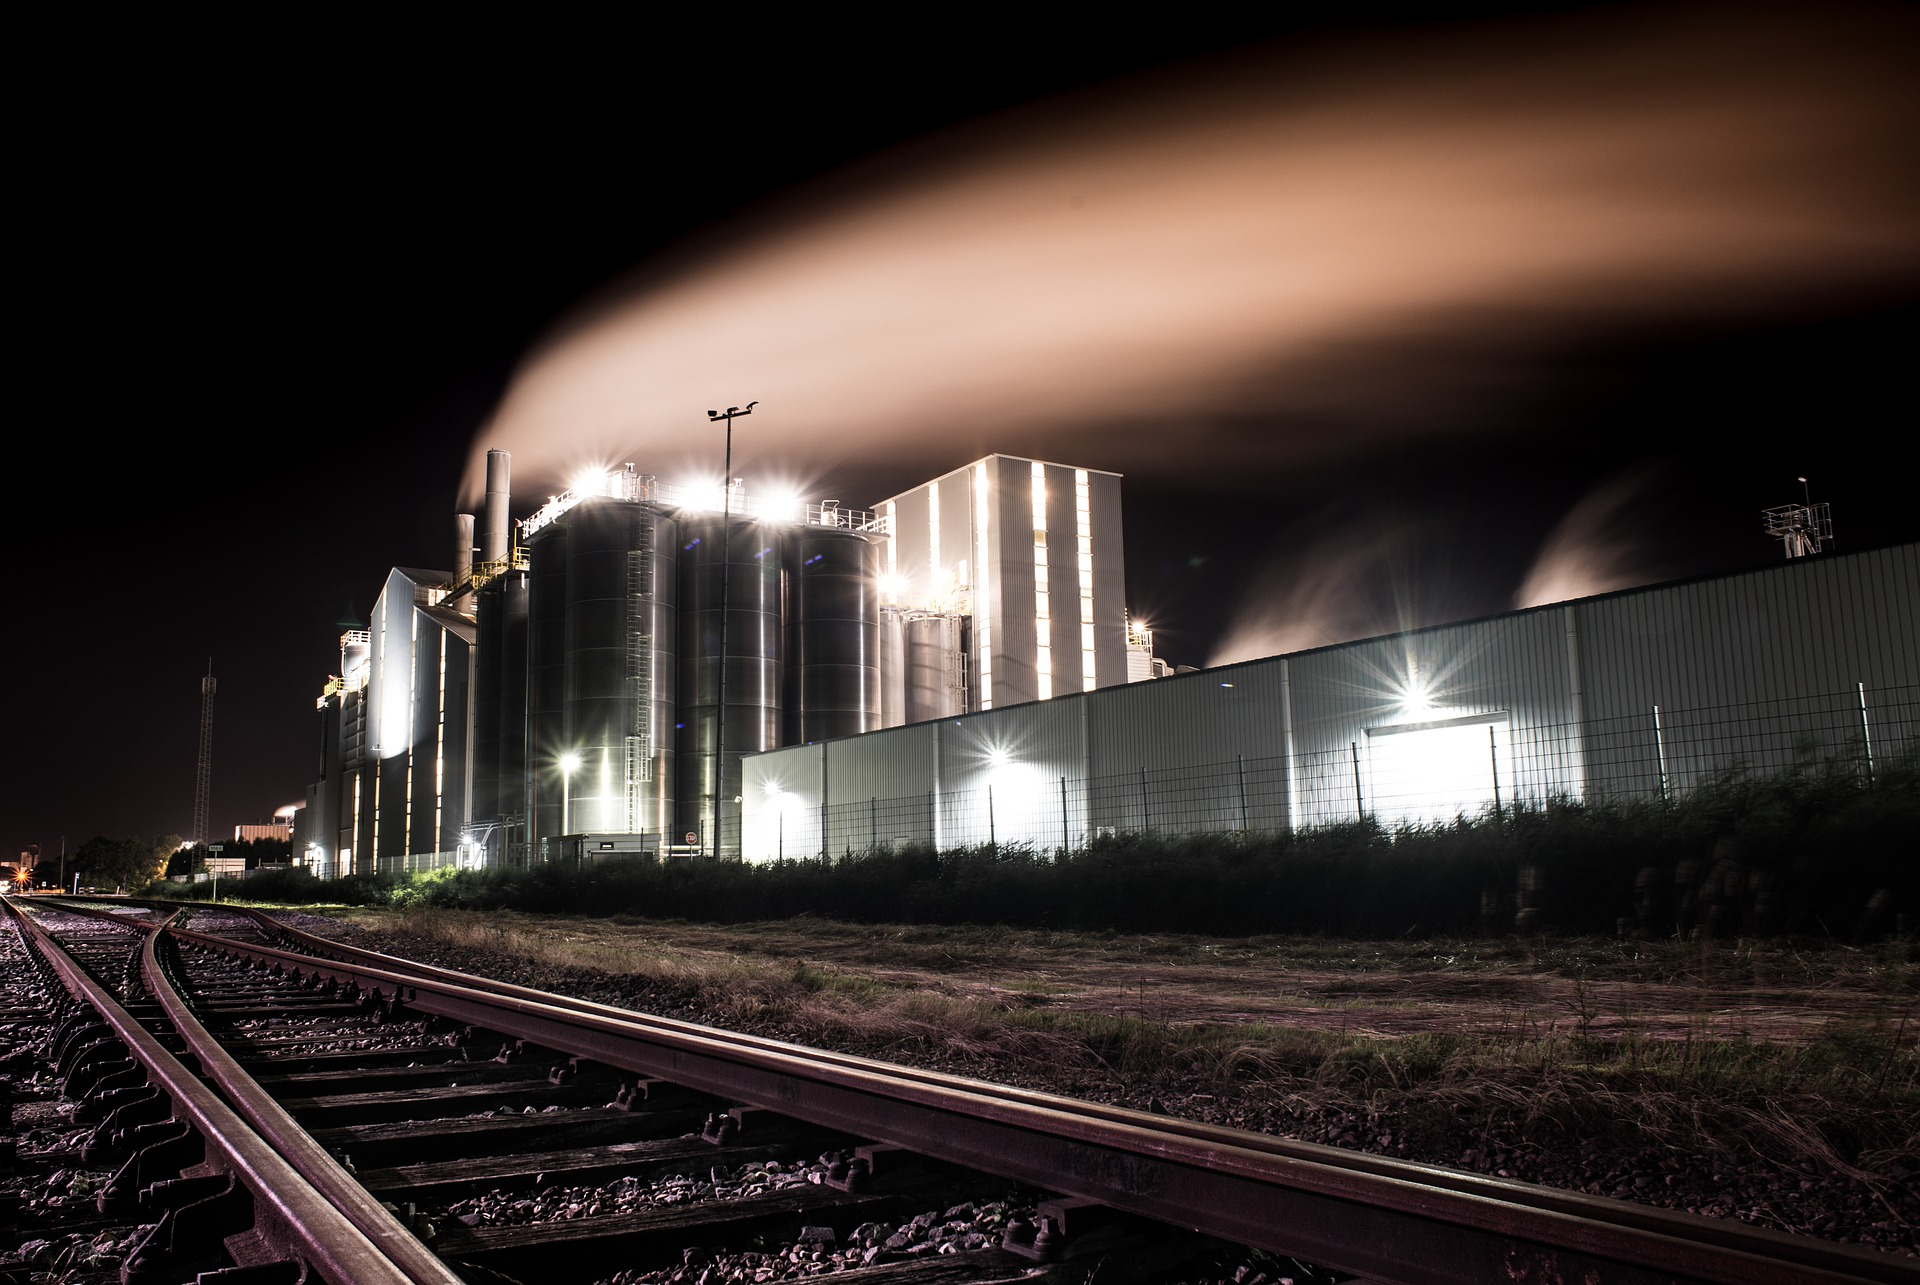 factory-1593842_1920.jpg